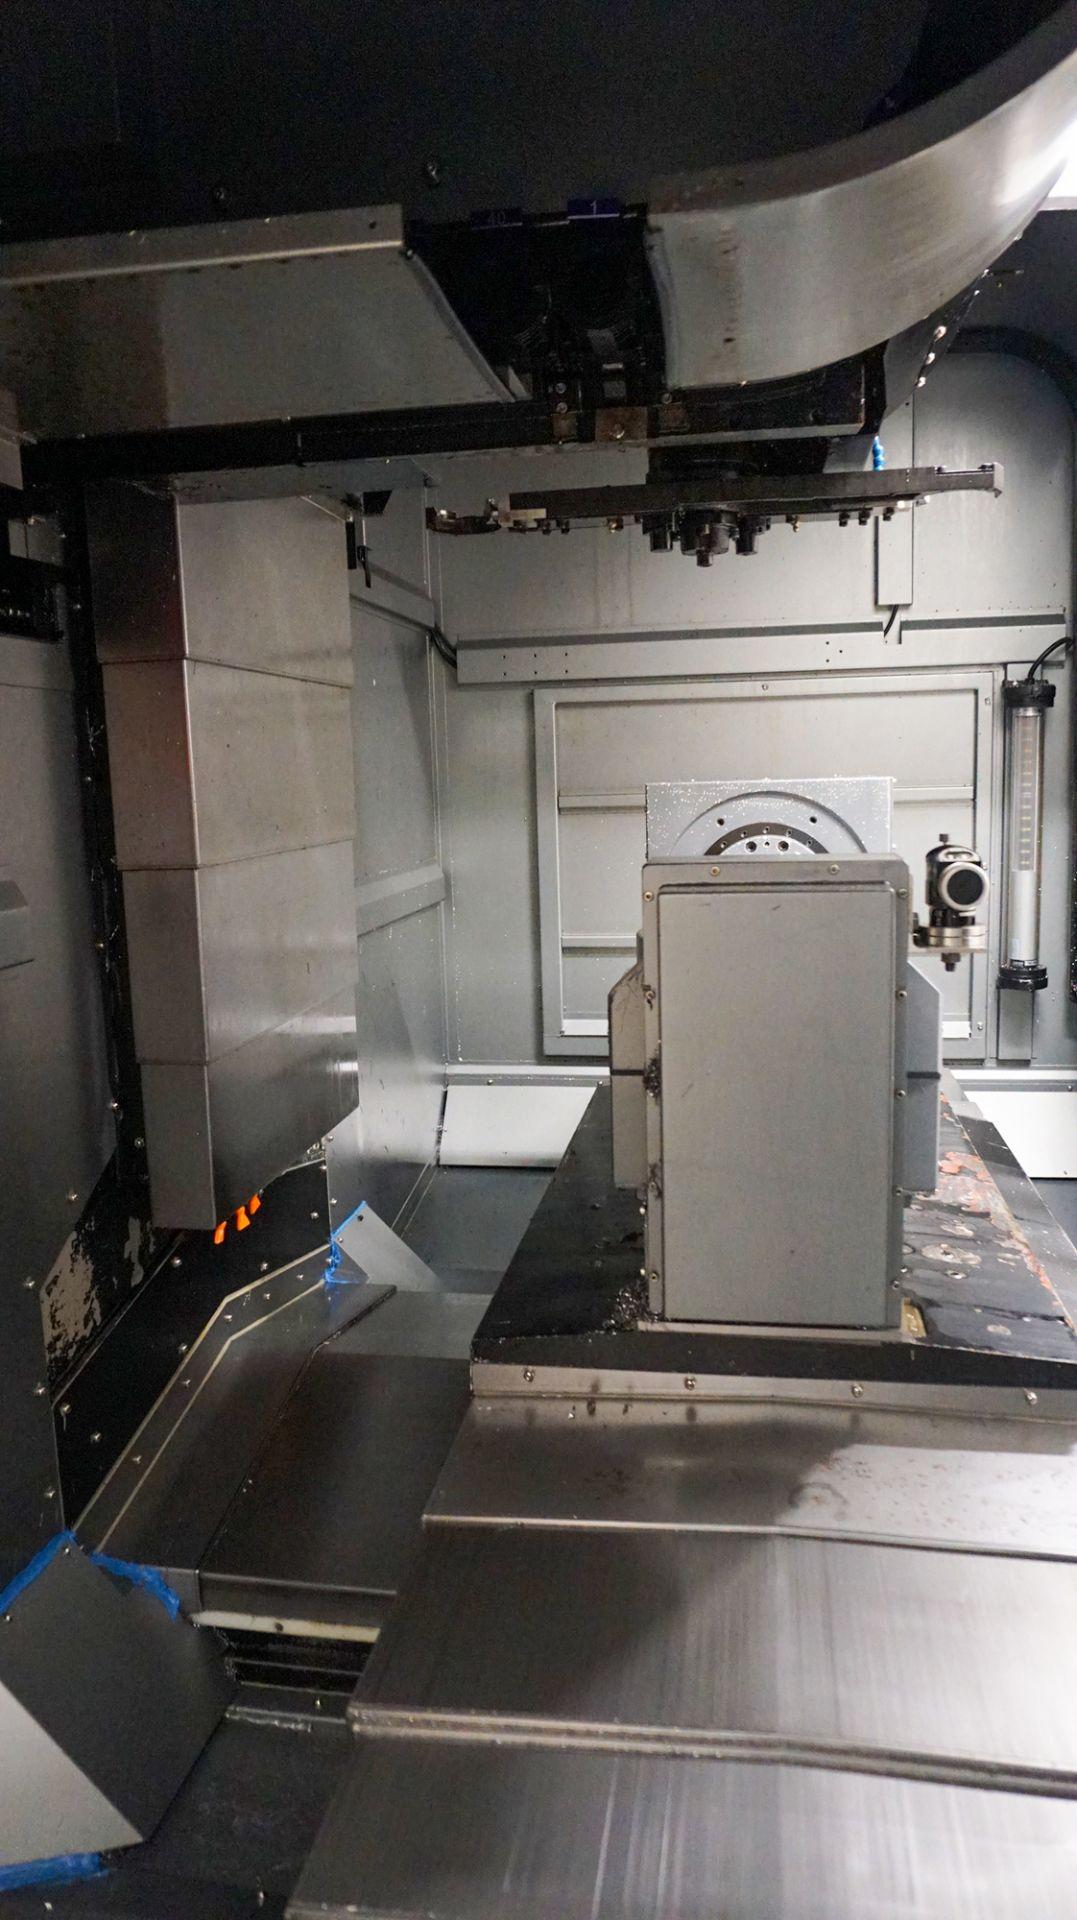 HURCO (2012) VMX42UI 5 AXIS CNC VERTICAL MACHINING CENTER WITH HURCO DUAL SCREEN CNC CONTROL, 13. - Image 13 of 20